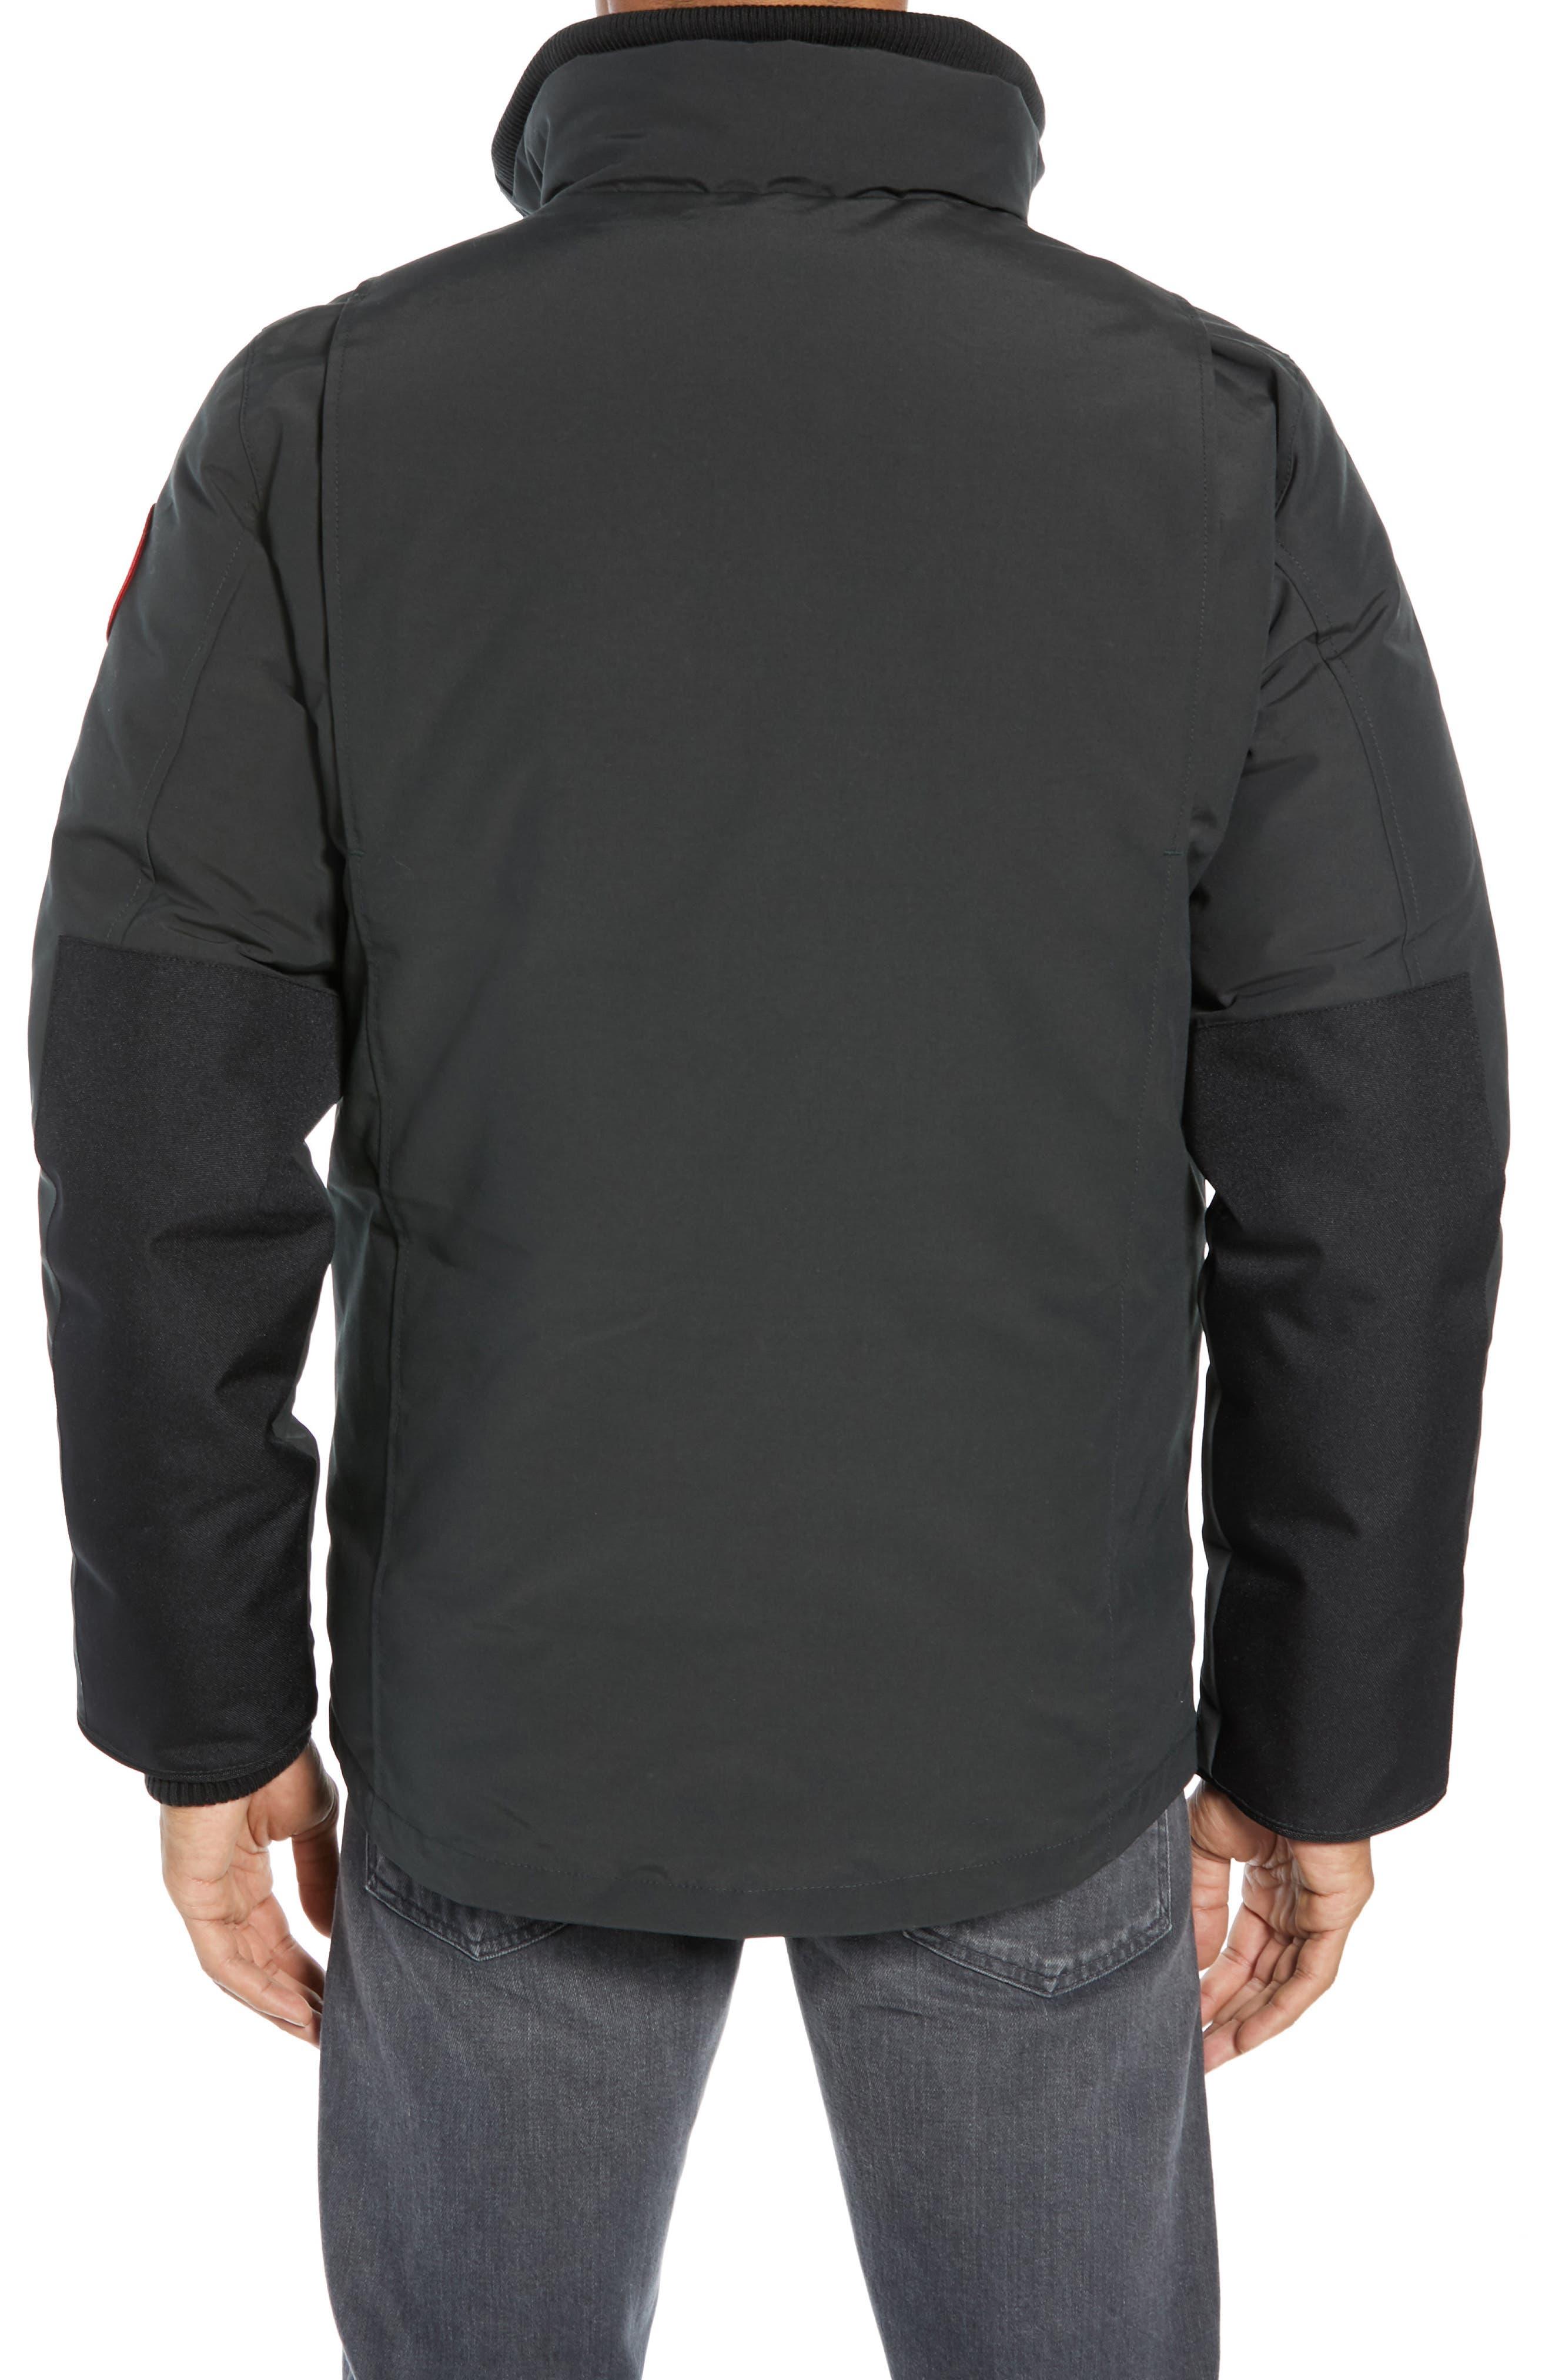 CANADA GOOSE,                             Forester Slim Fit Jacket,                             Alternate thumbnail 2, color,                             BLACK